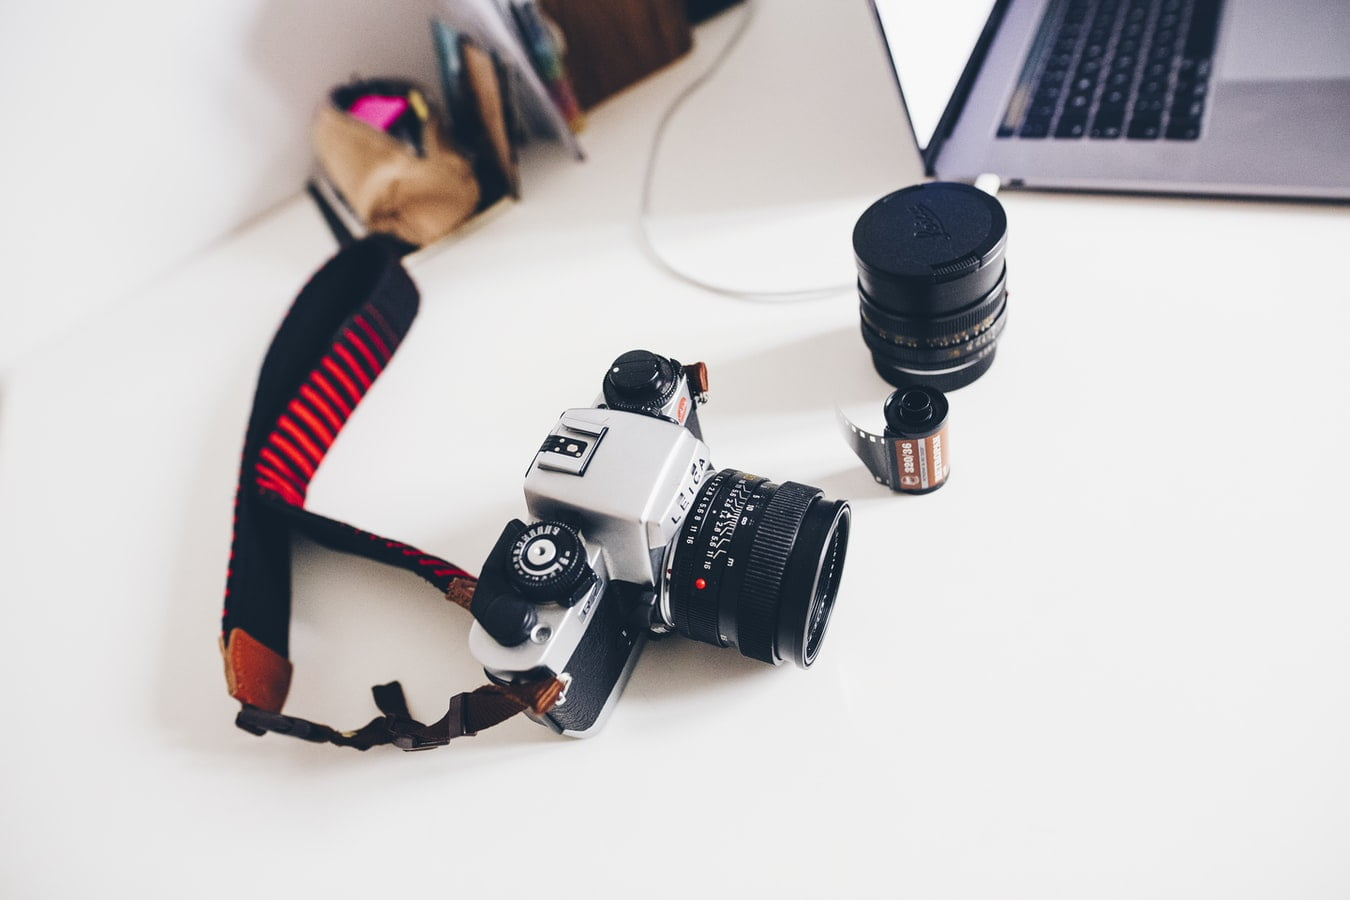 Professional photography equipment at the Lisa Rowland Photography Studio in Trenton, Florida